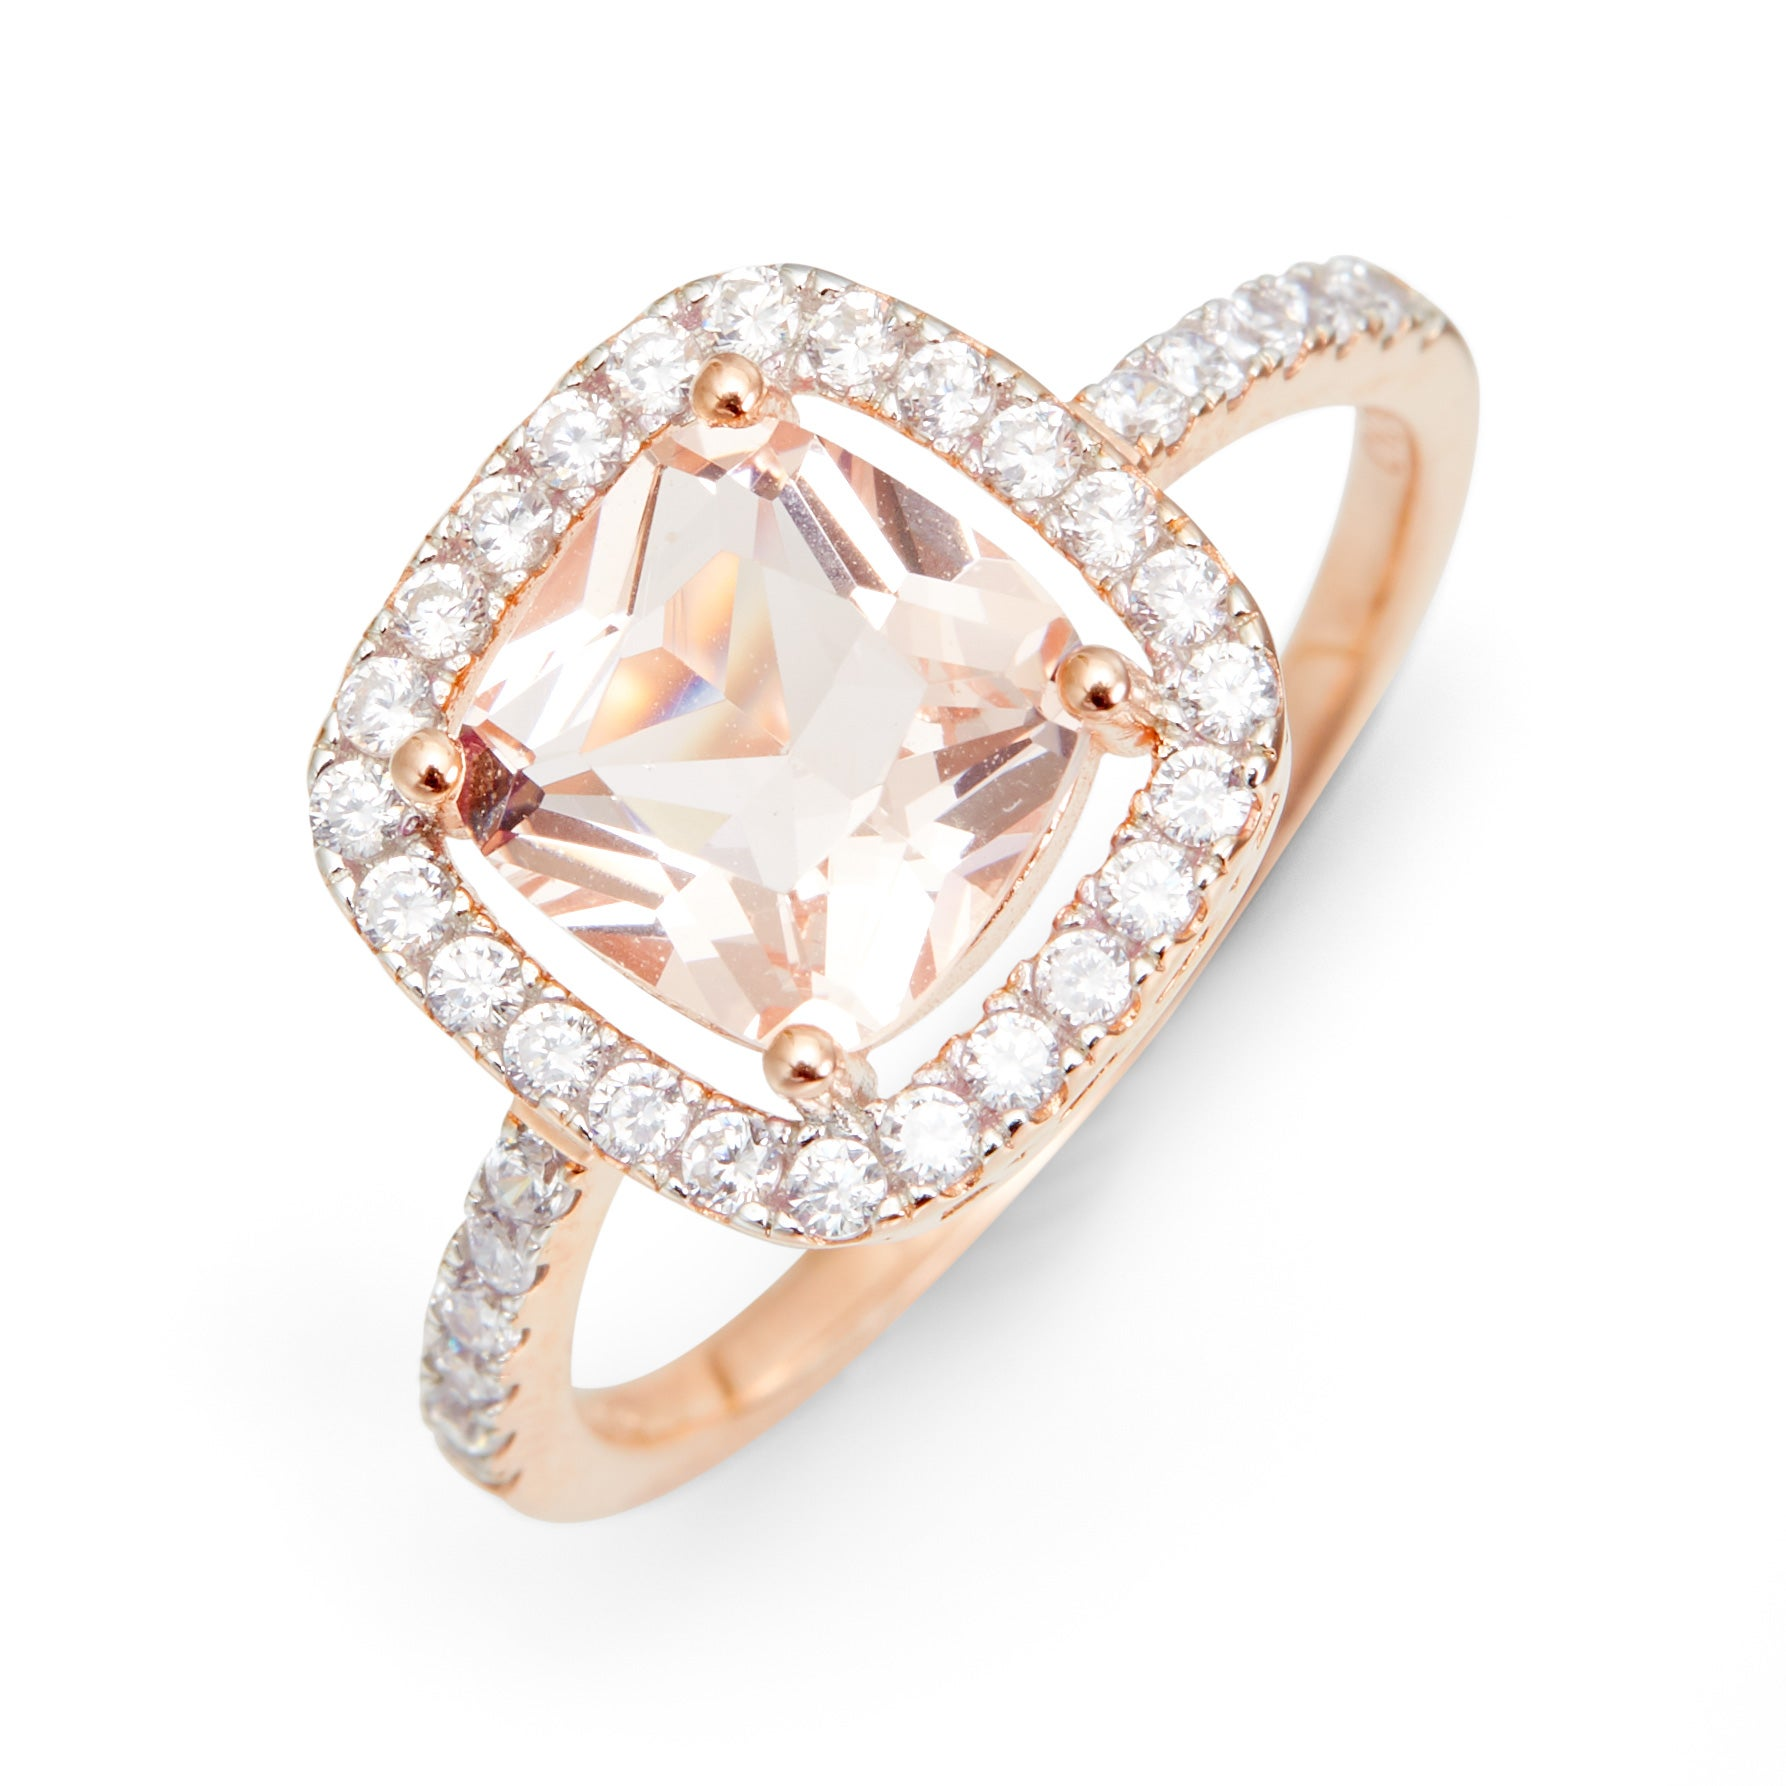 Morganite Cushion Cut Rose Gold Engagement Ring